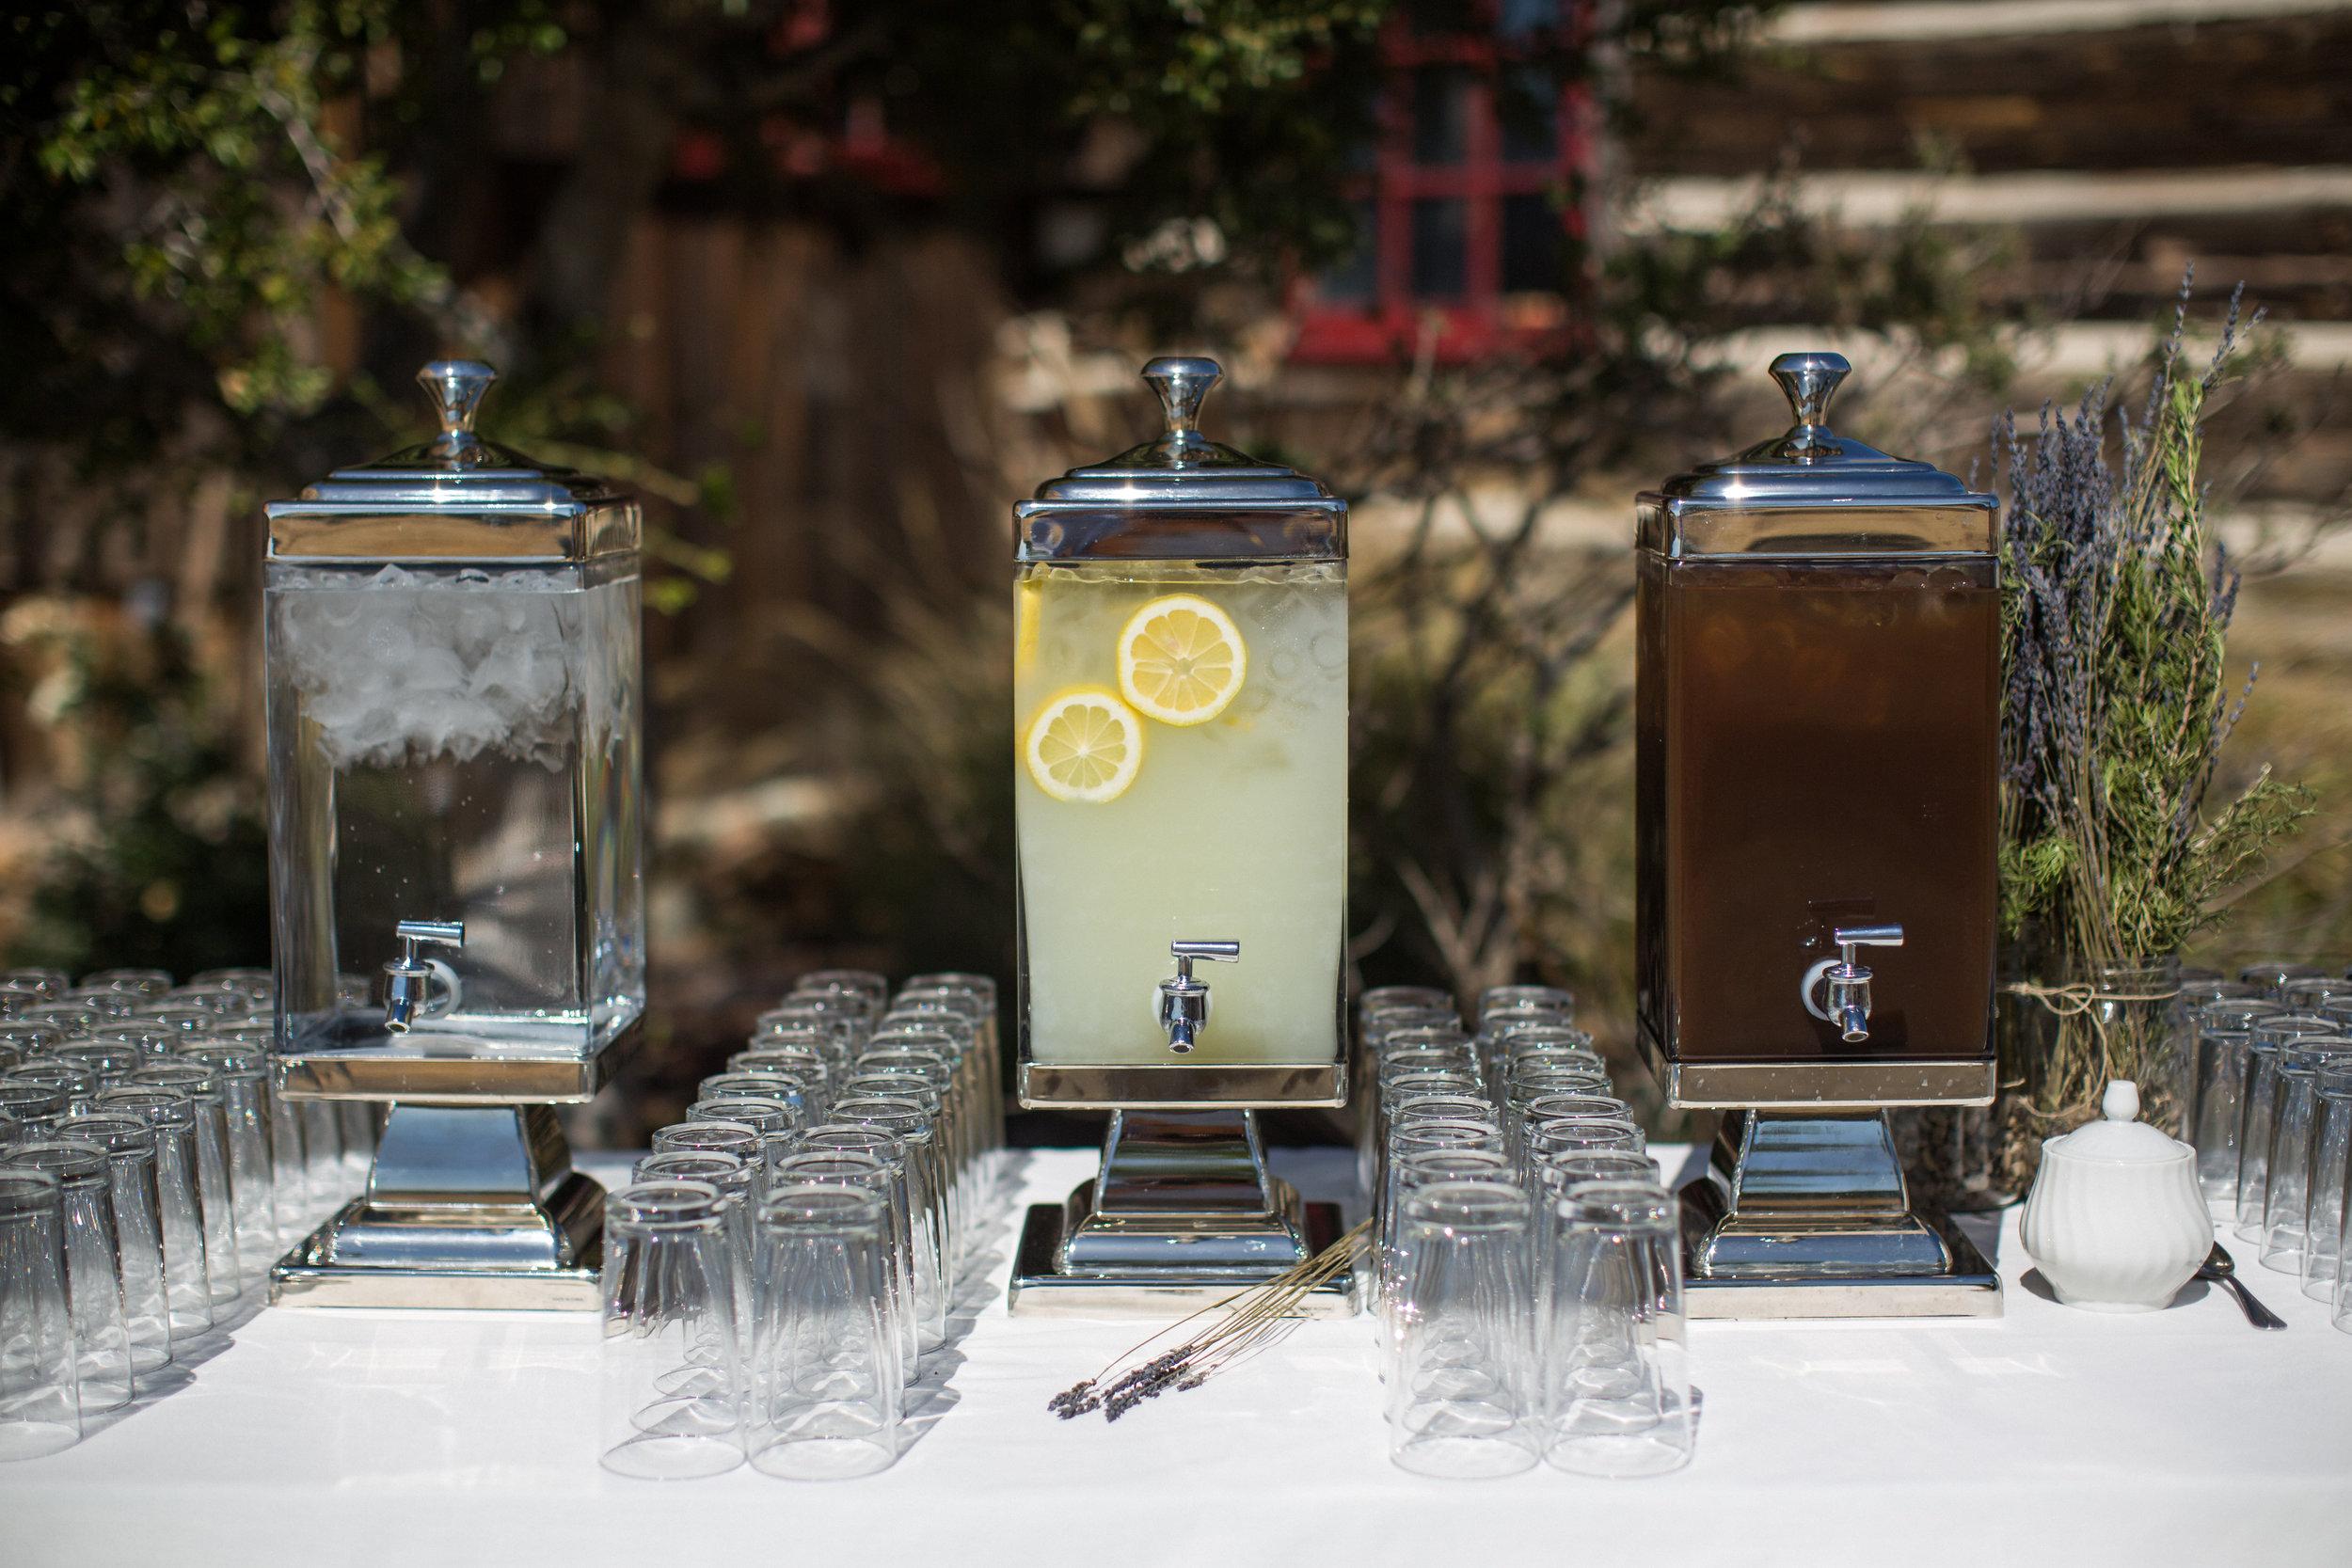 www.santabarbarawedding.com | Kiel Rucker Photography | Joelle Charming Wedding Planner | Figueroa Mountain Farmhouse | La Tavola Linens | Reception